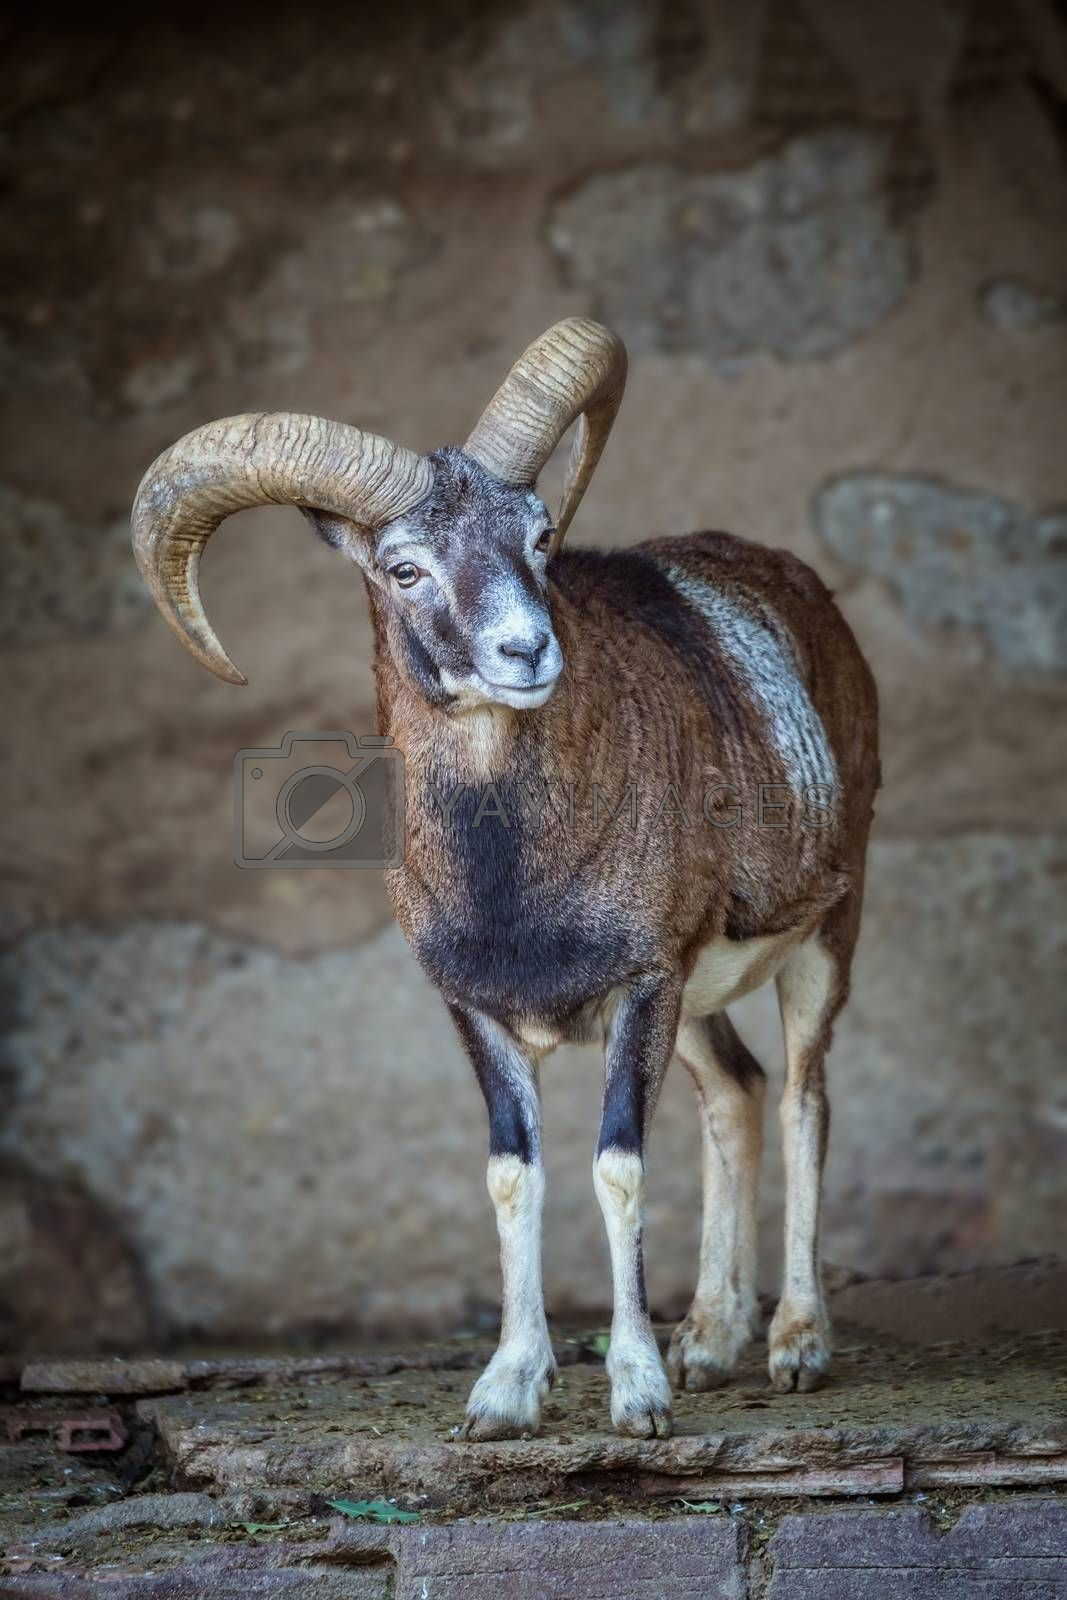 Adult mouflon aries in the zoo of Barcelona in Spain